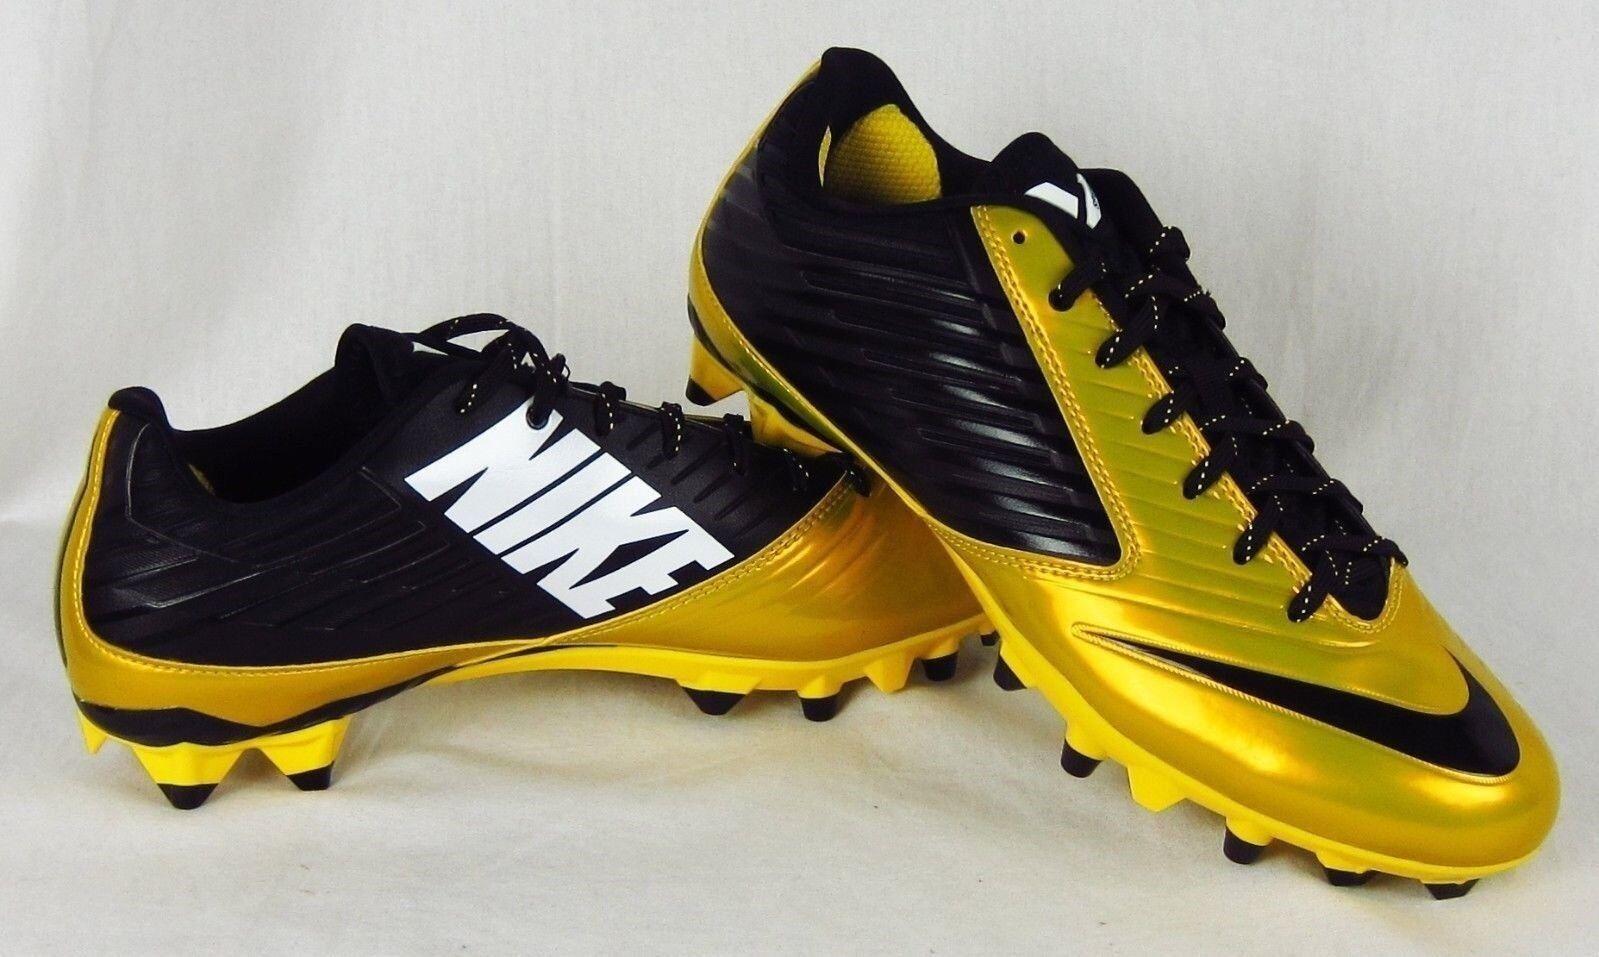 New Nike Men's Vapor Low Football Cleats Yellow